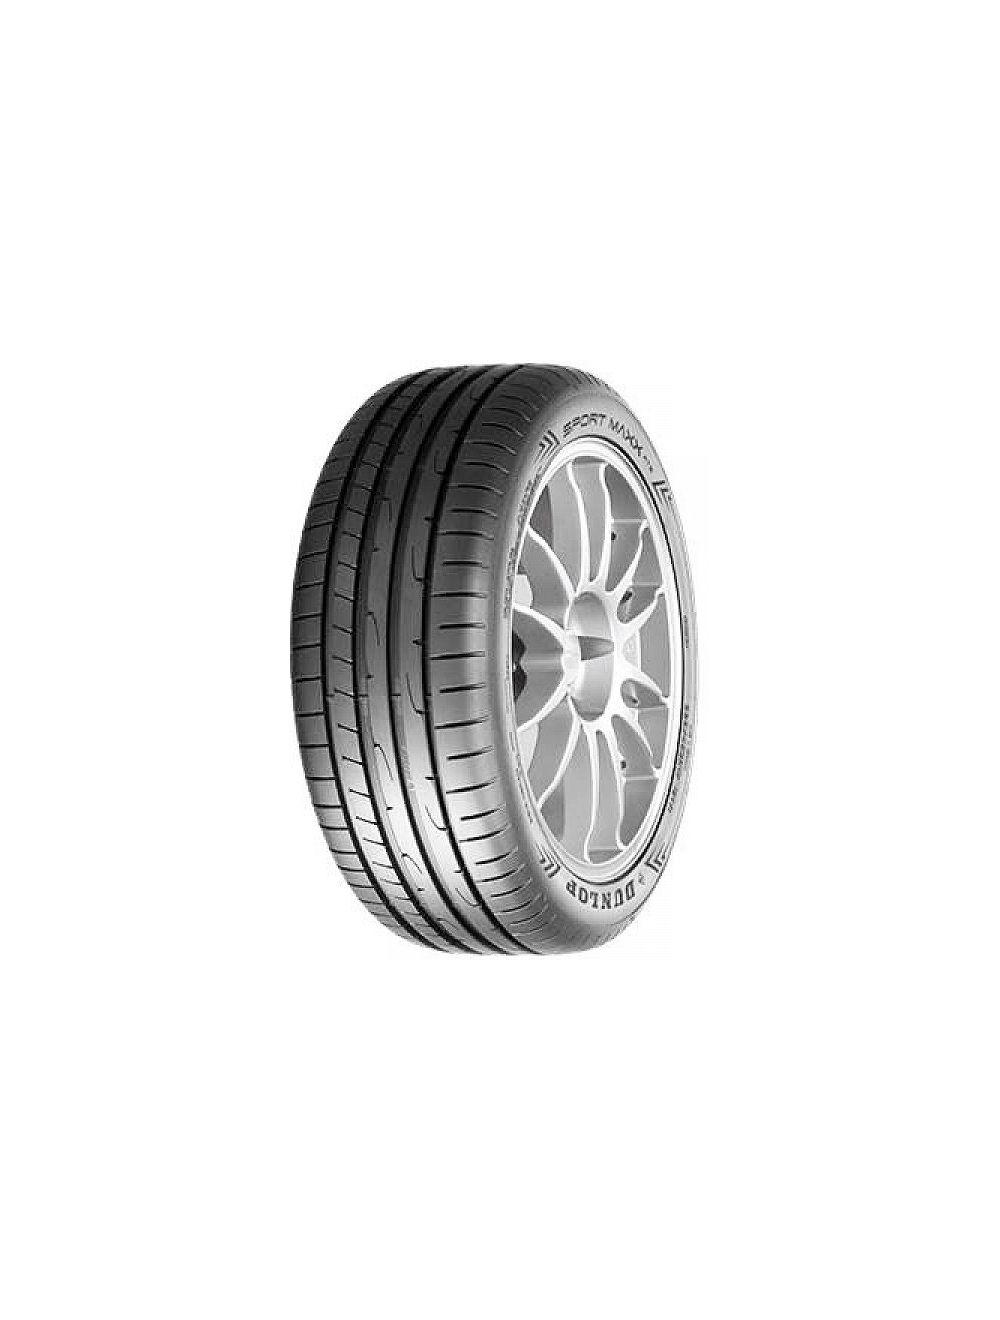 Dunlop 235/50R18 V SP Sport Maxx RT2 SUV MFS Nyári gumi